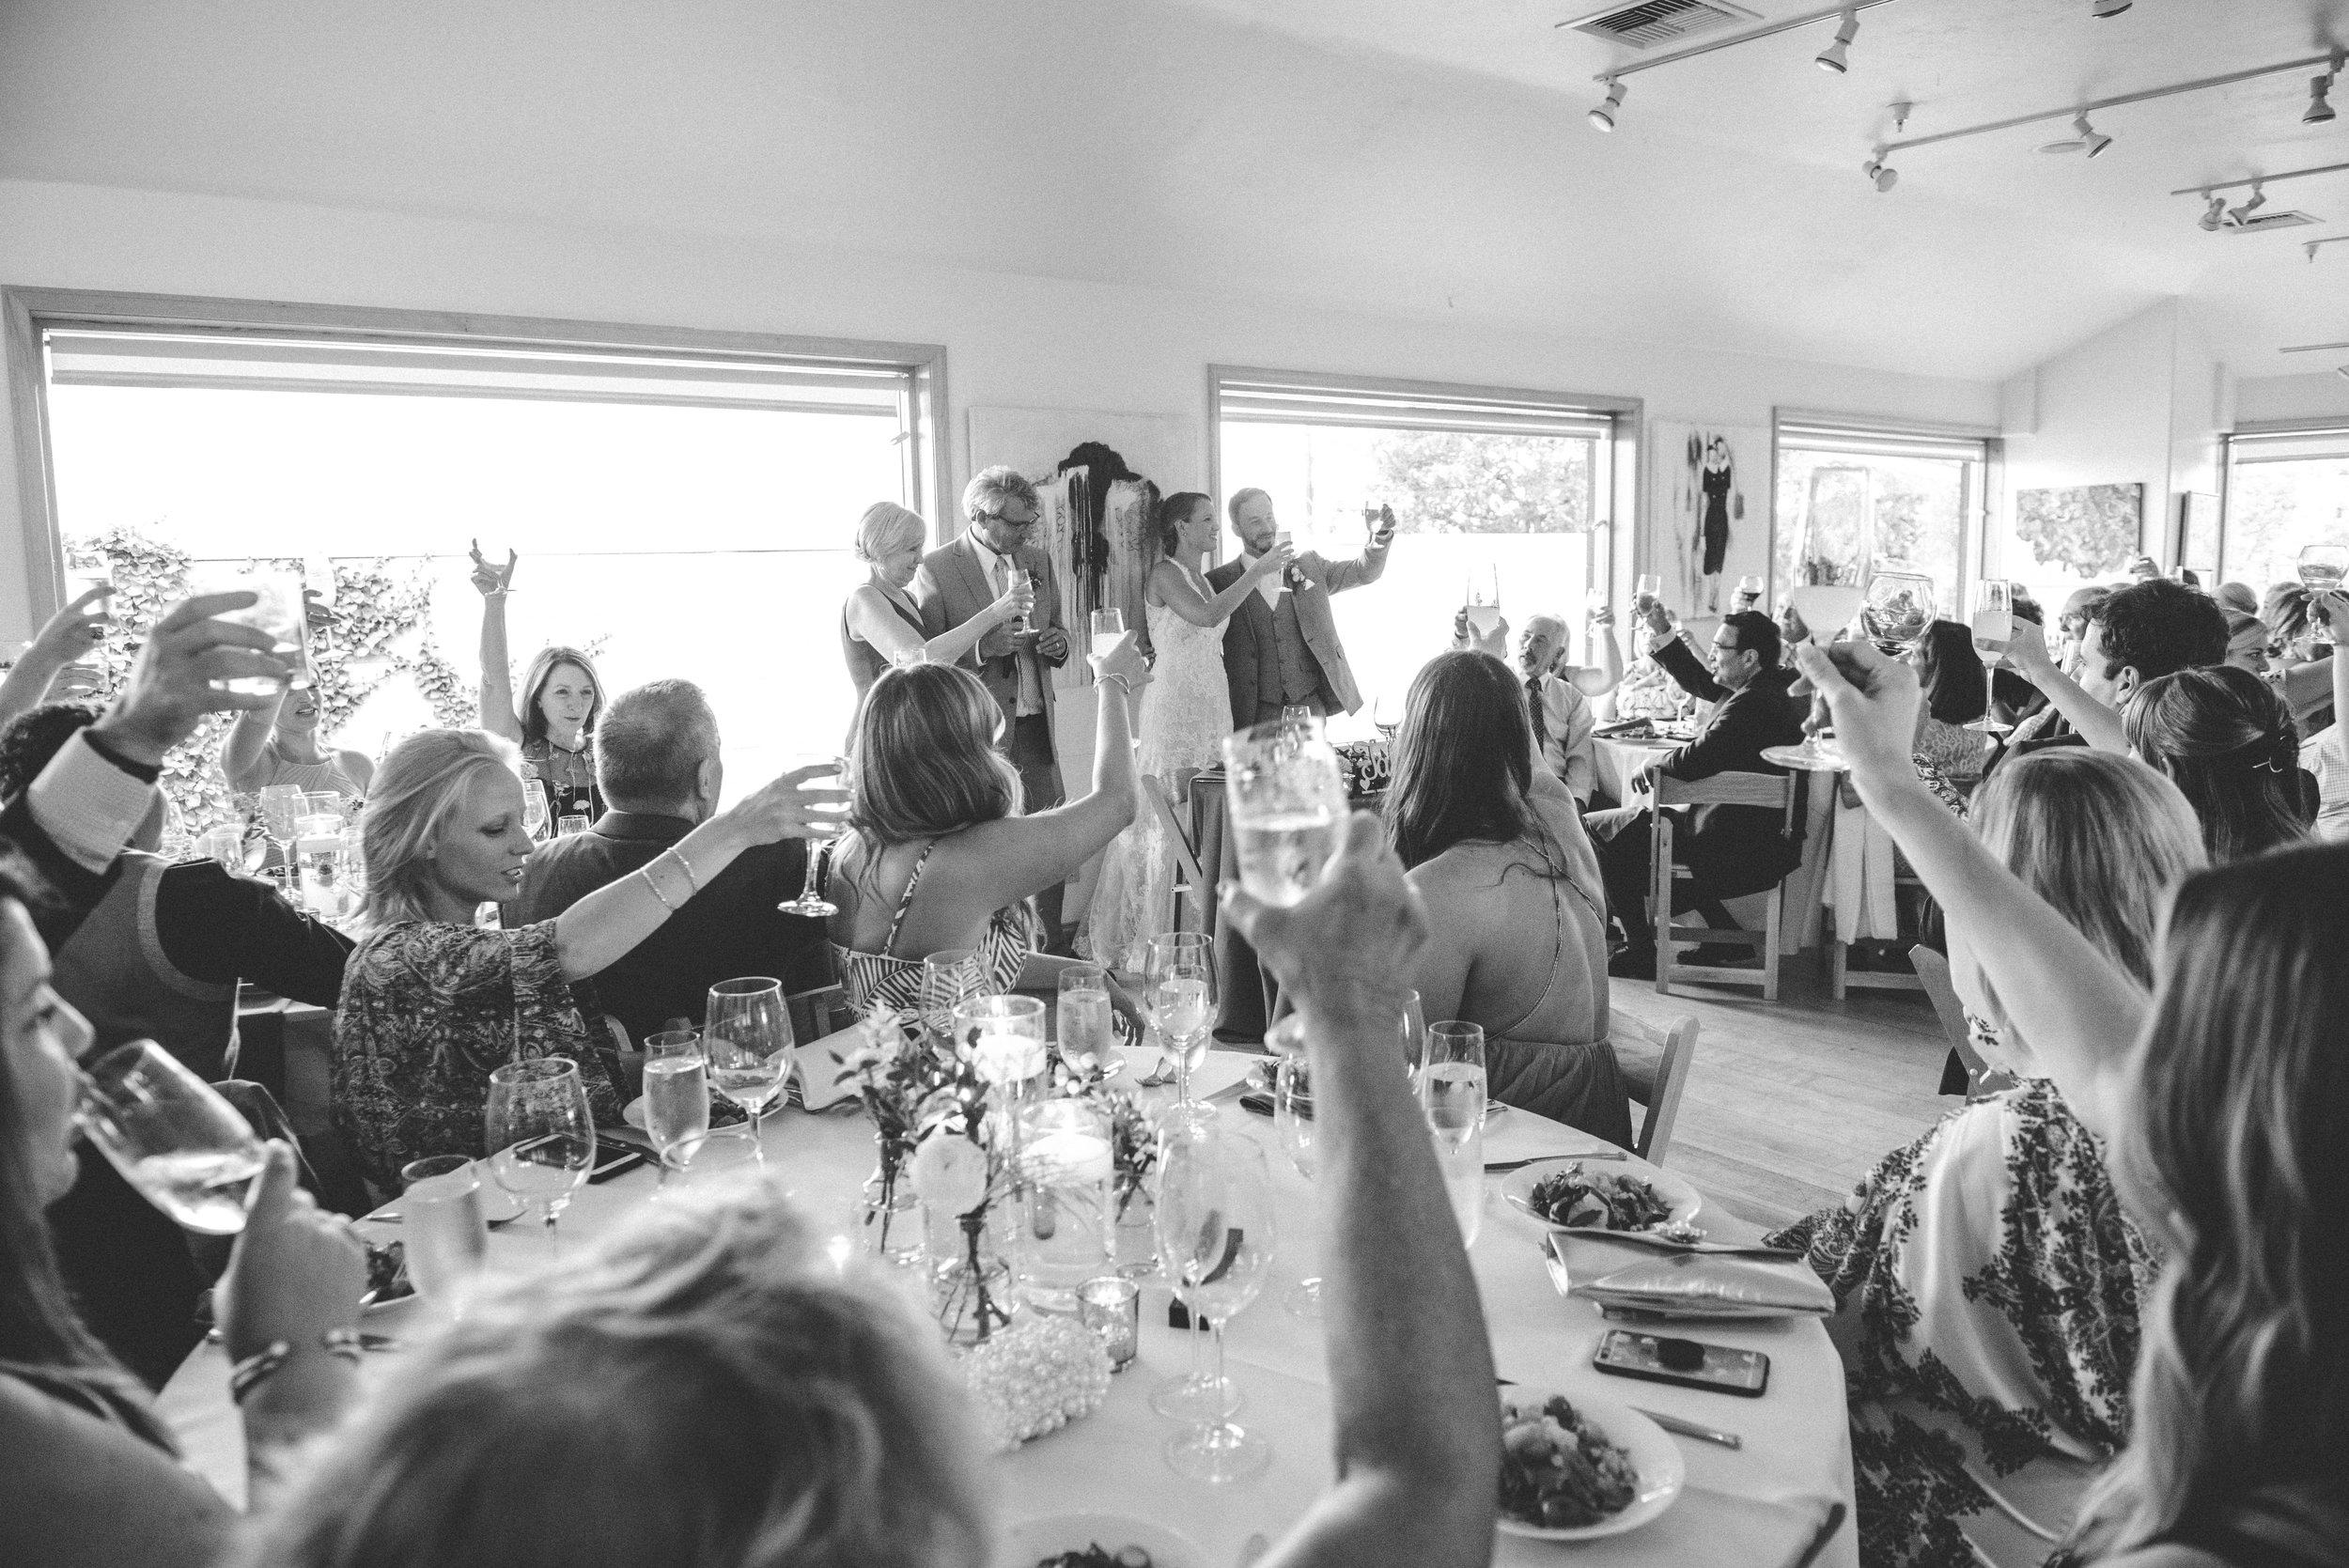 ChadFahnestockPhotography-mc-wedding-023.jpg